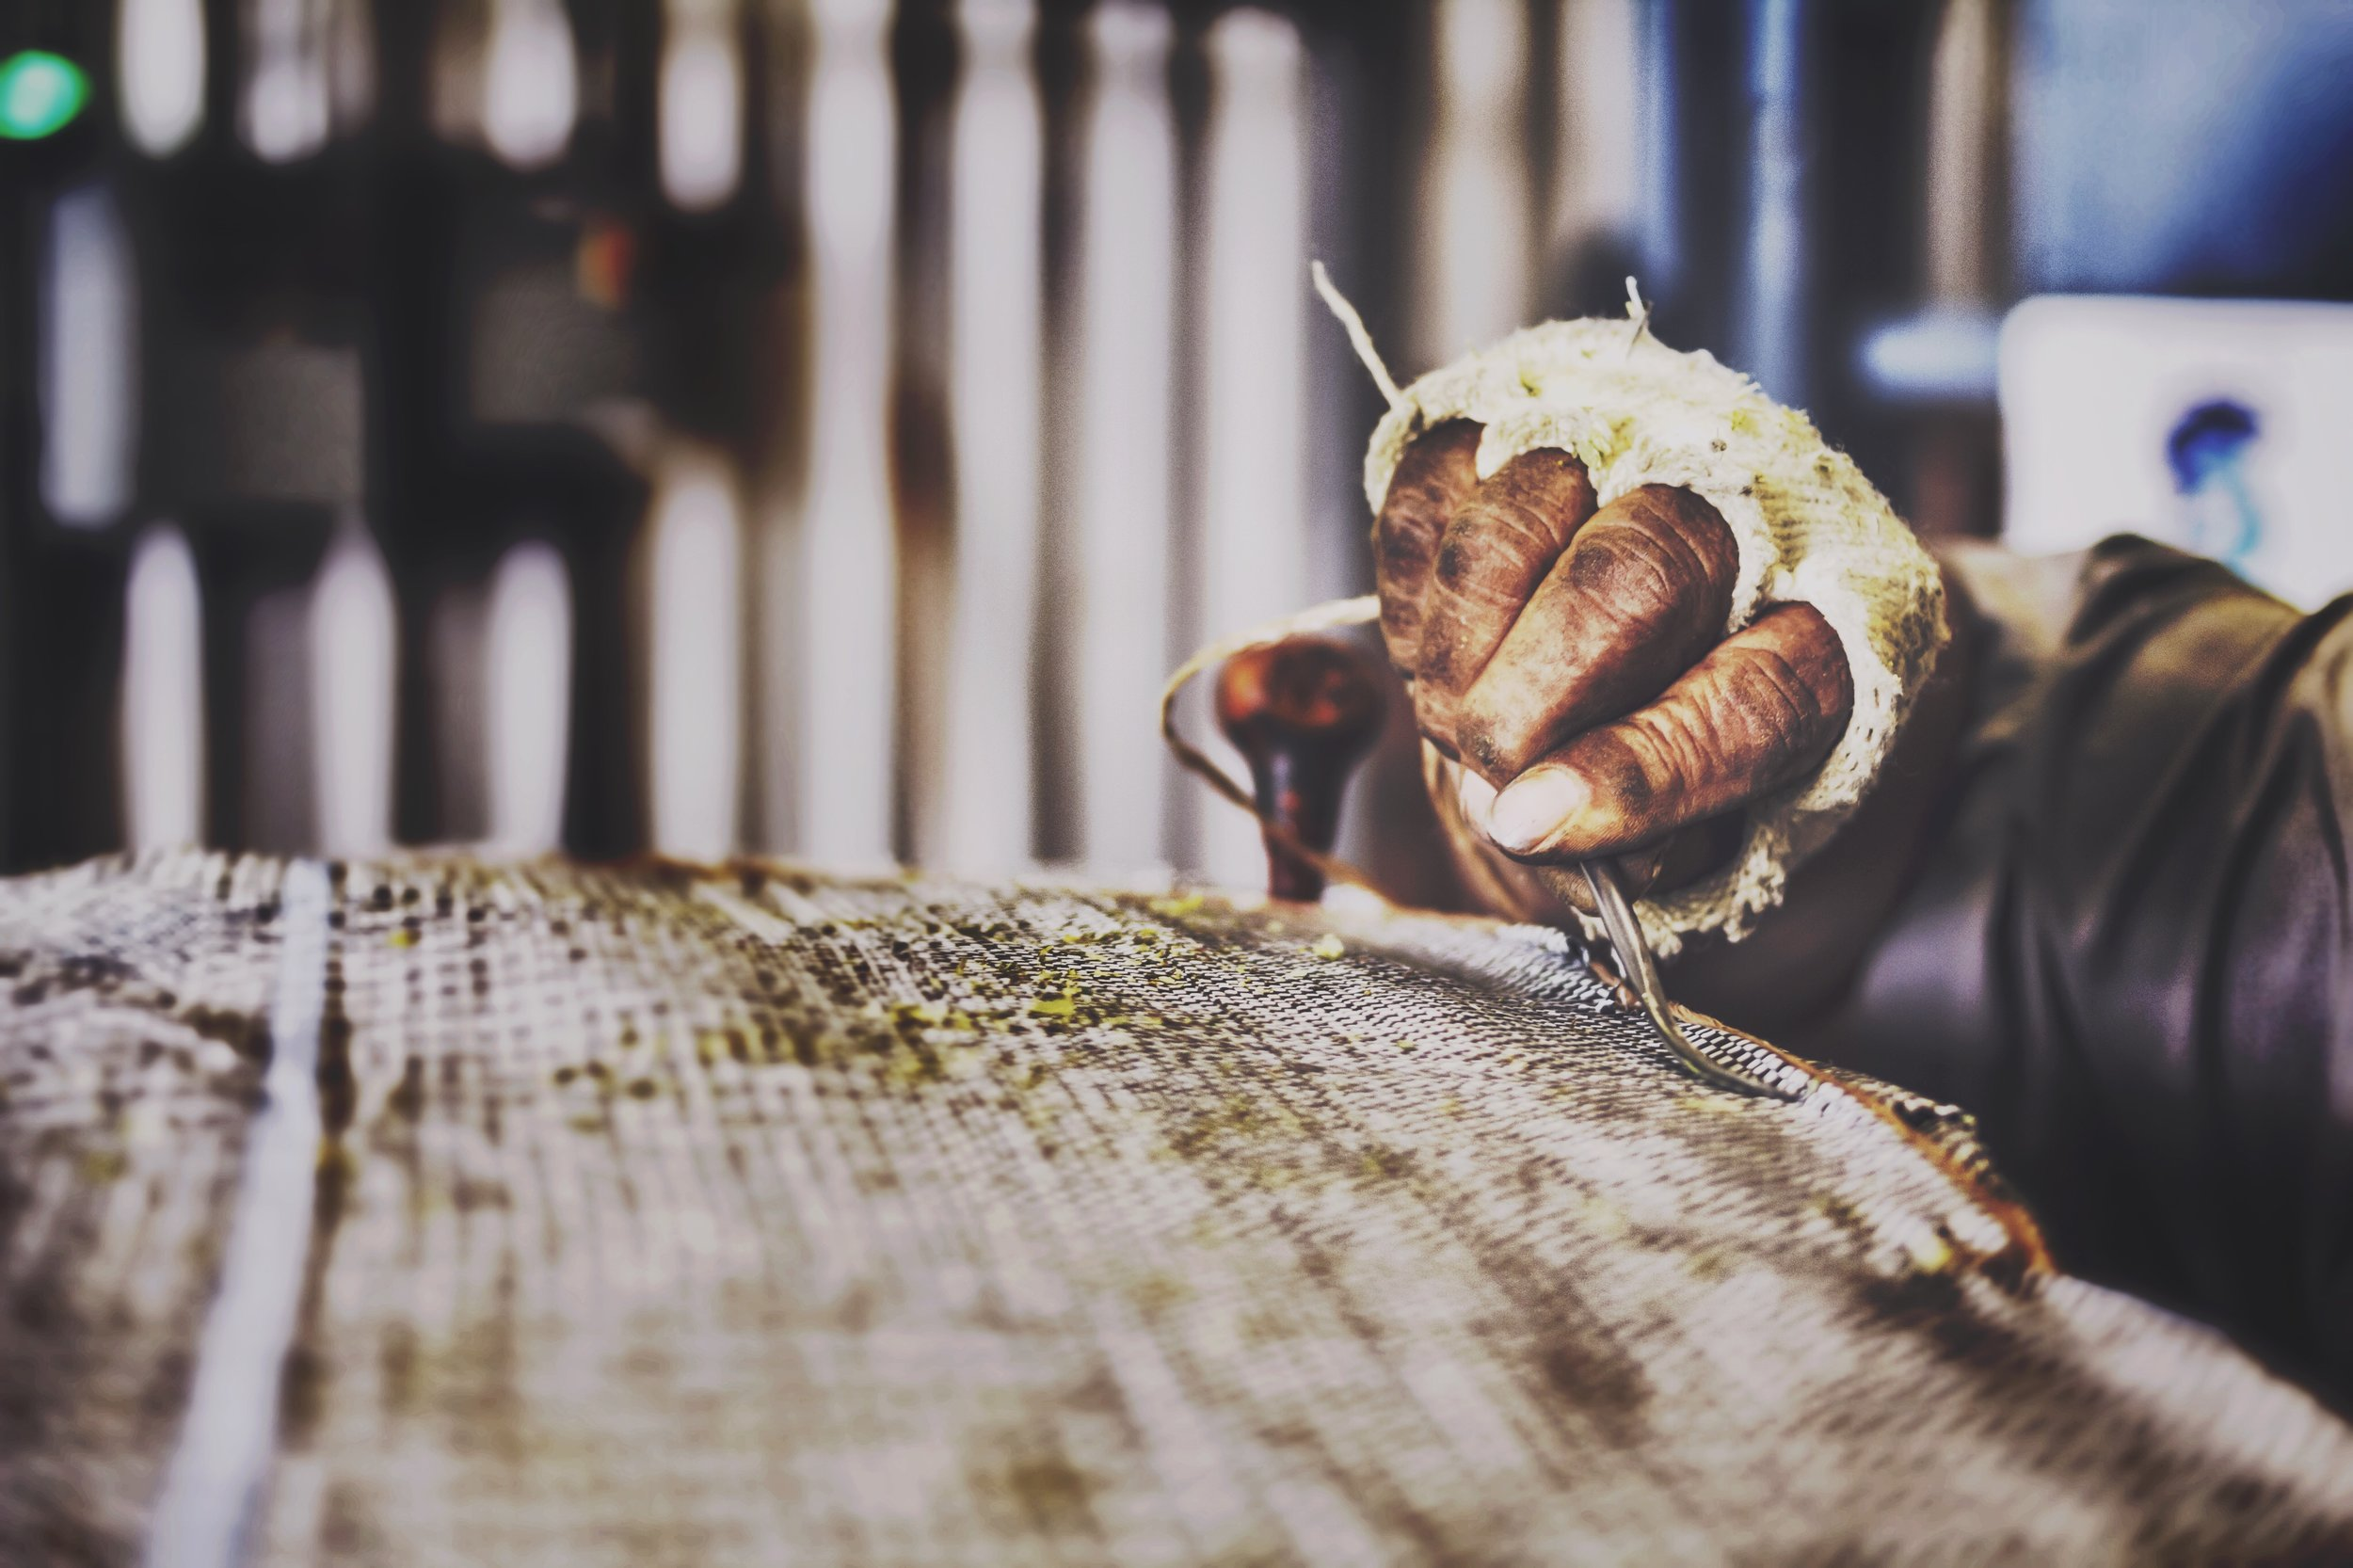 Hand Sewing Hop Bale.JPG